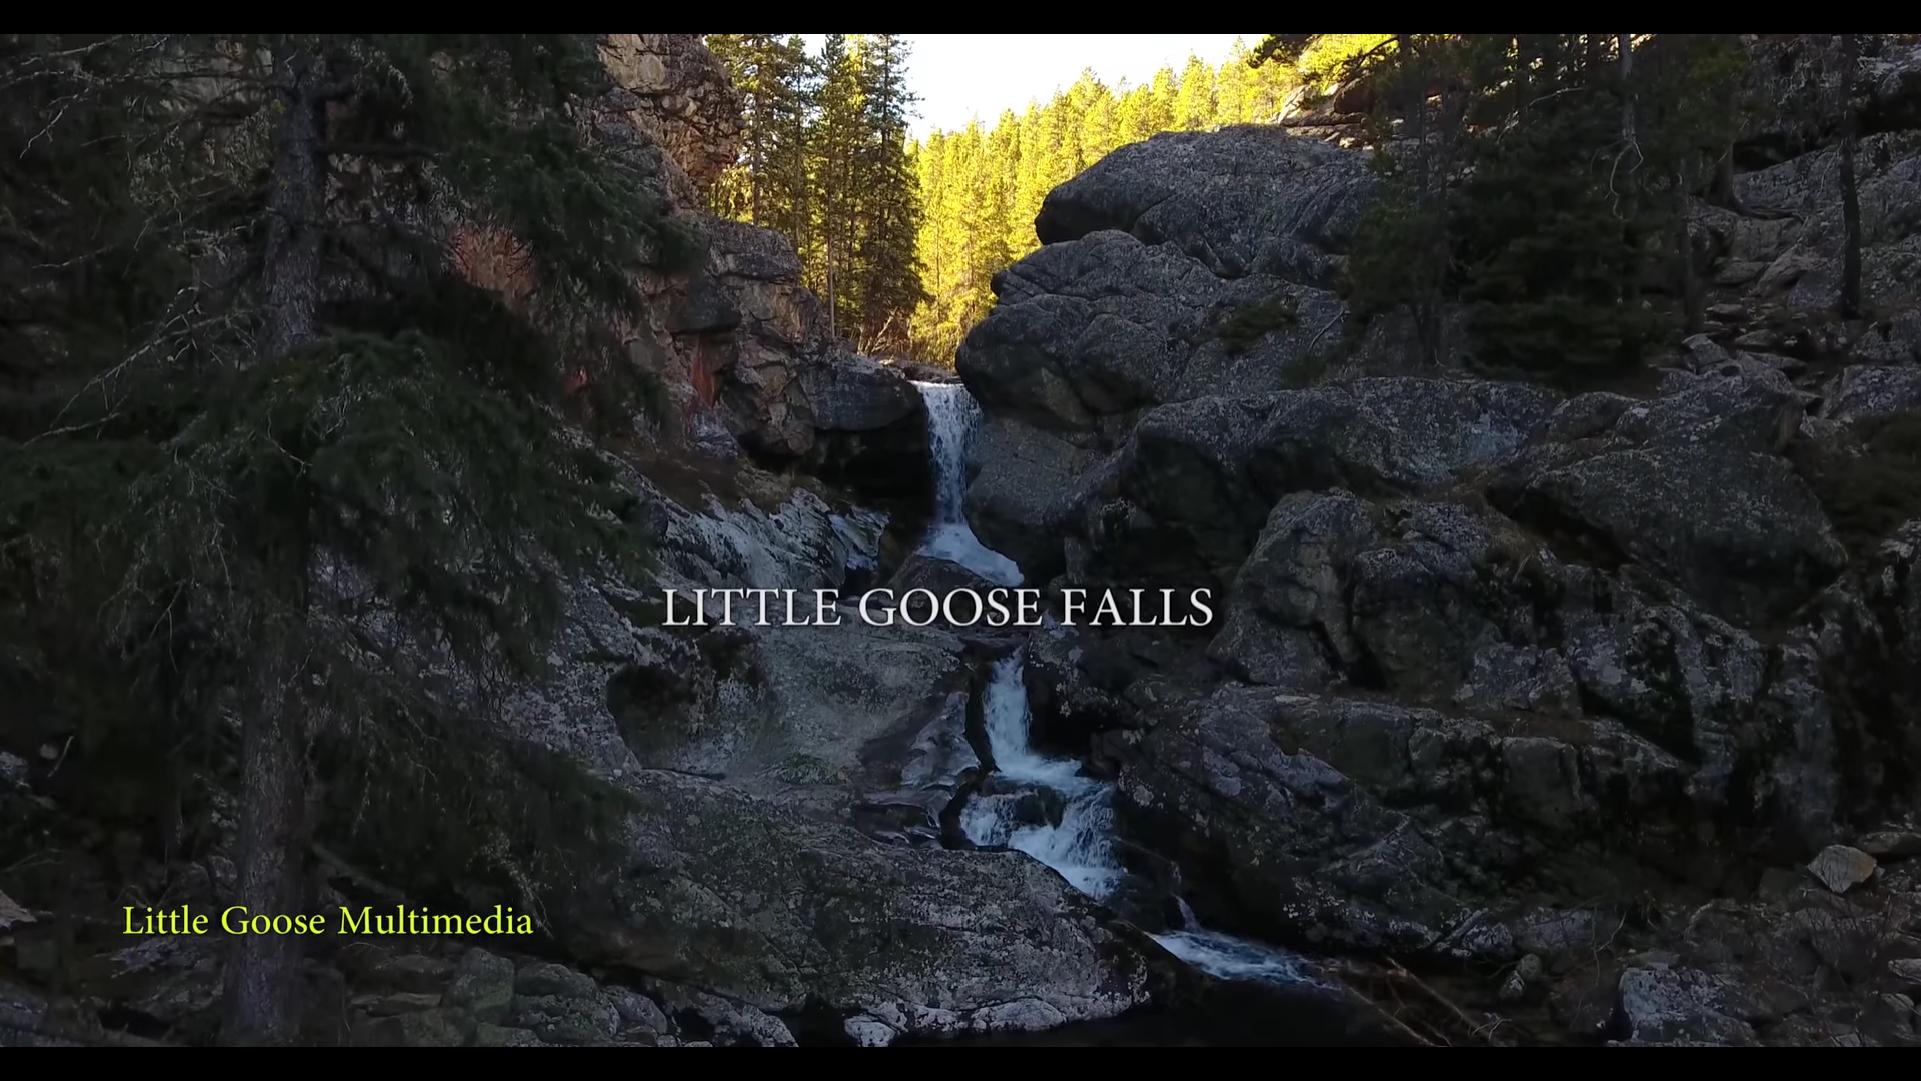 Little Goose Falls